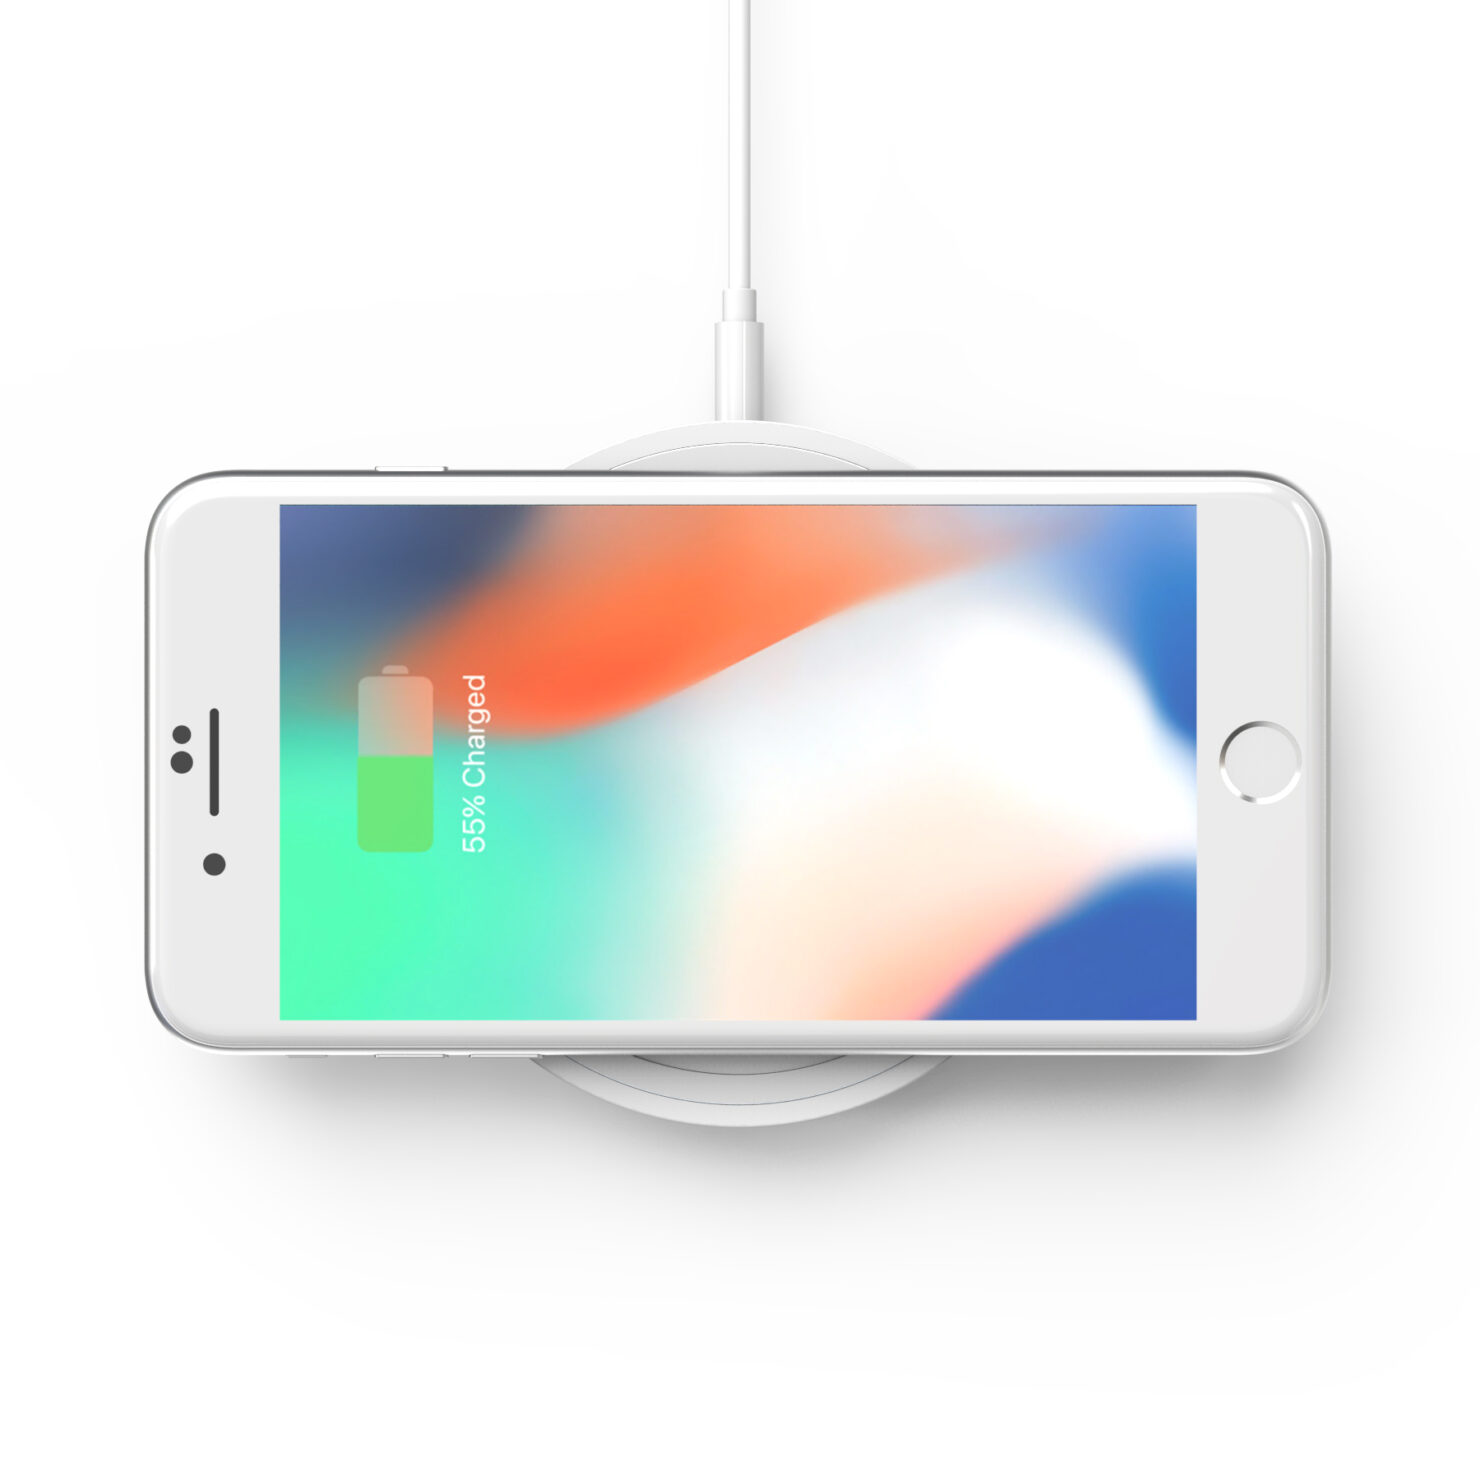 bold_charging_pad_iphone_5